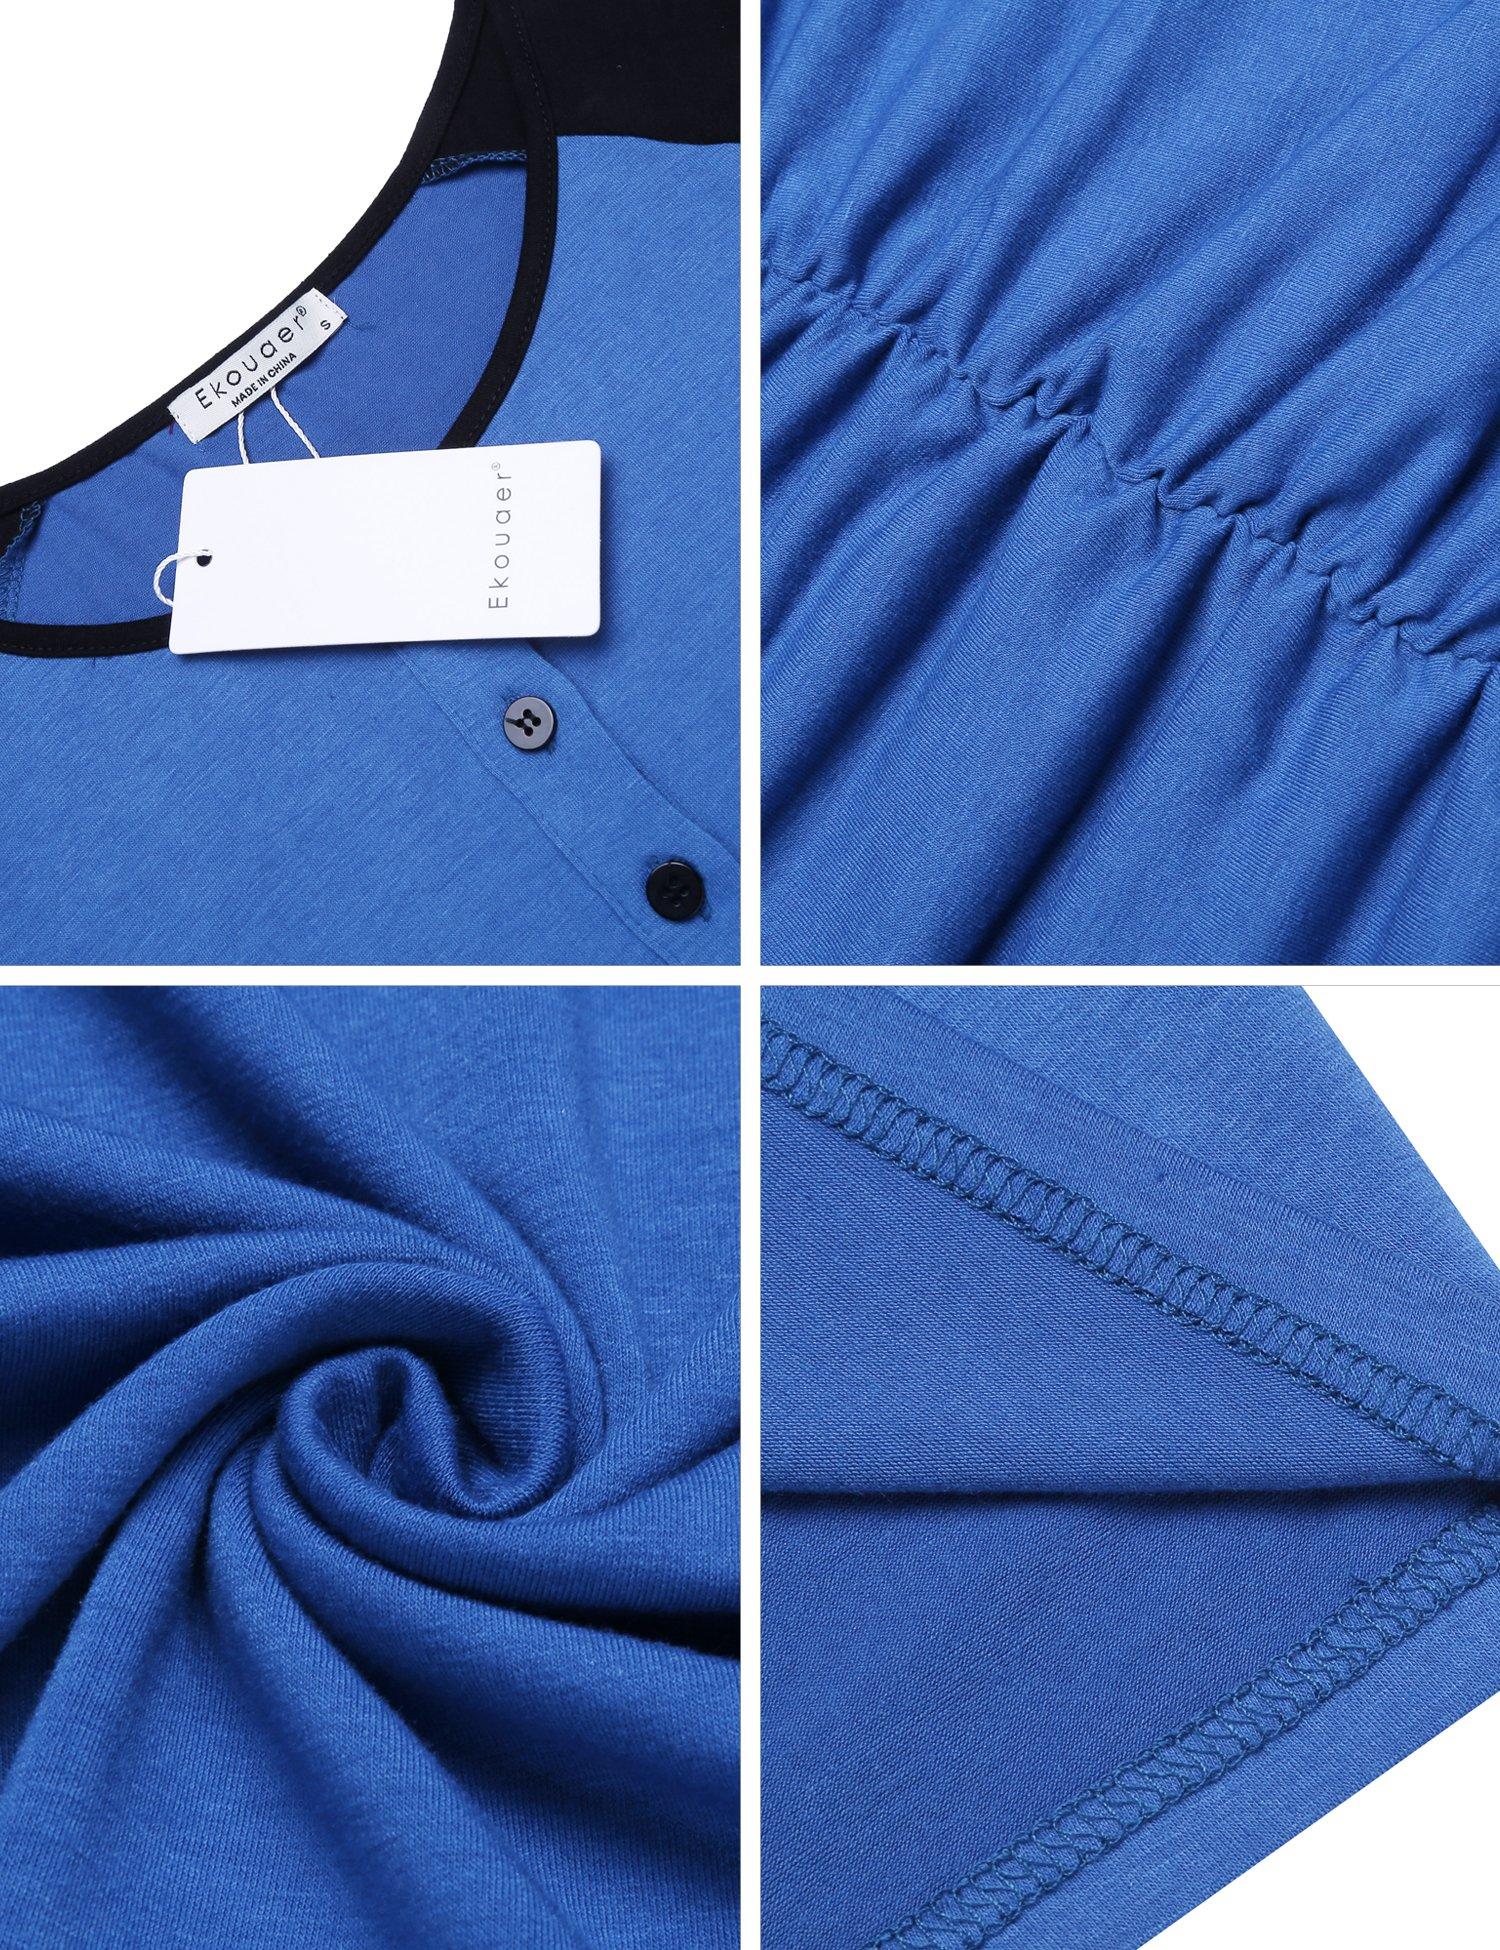 Ekouaer Women's Ruched Maternity Bodycon Dress Causual Short Sleeve Wrap Dresses Blue S by Ekouaer (Image #6)